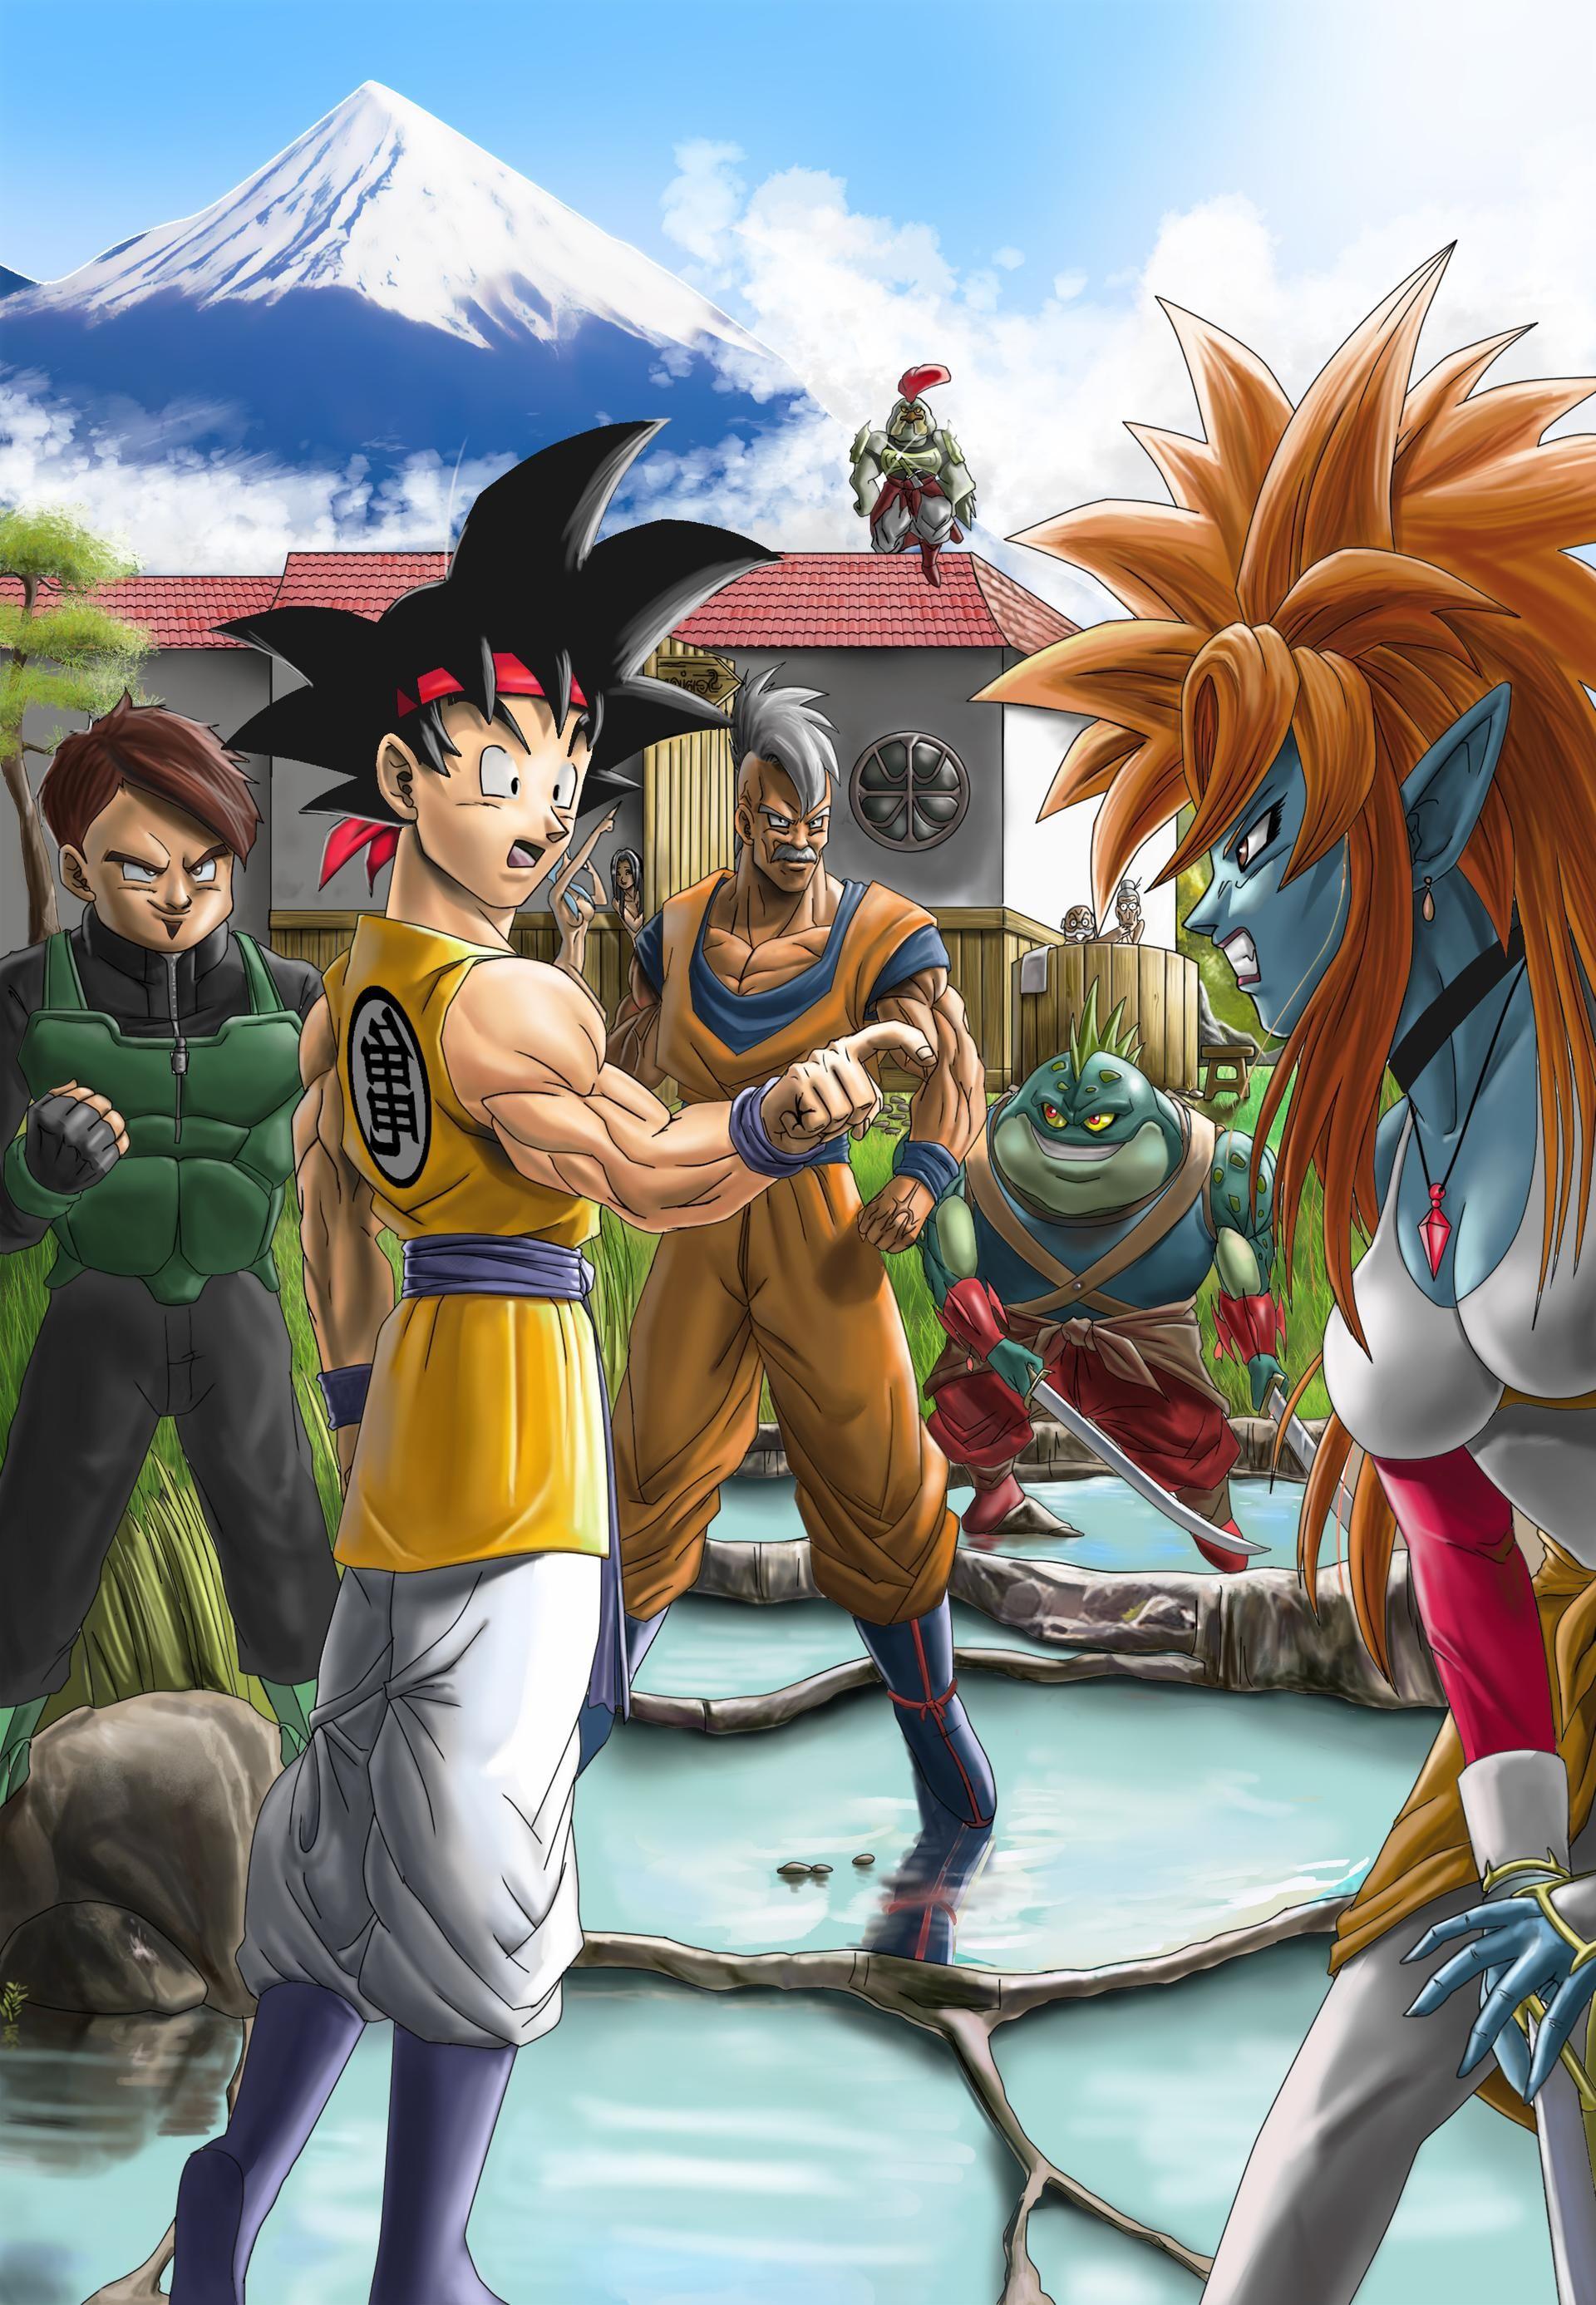 Goku Jr And Old Oob By Elitenappa On Deviantart In 2021 Dragon Ball Art Goku Dragon Ball Gt